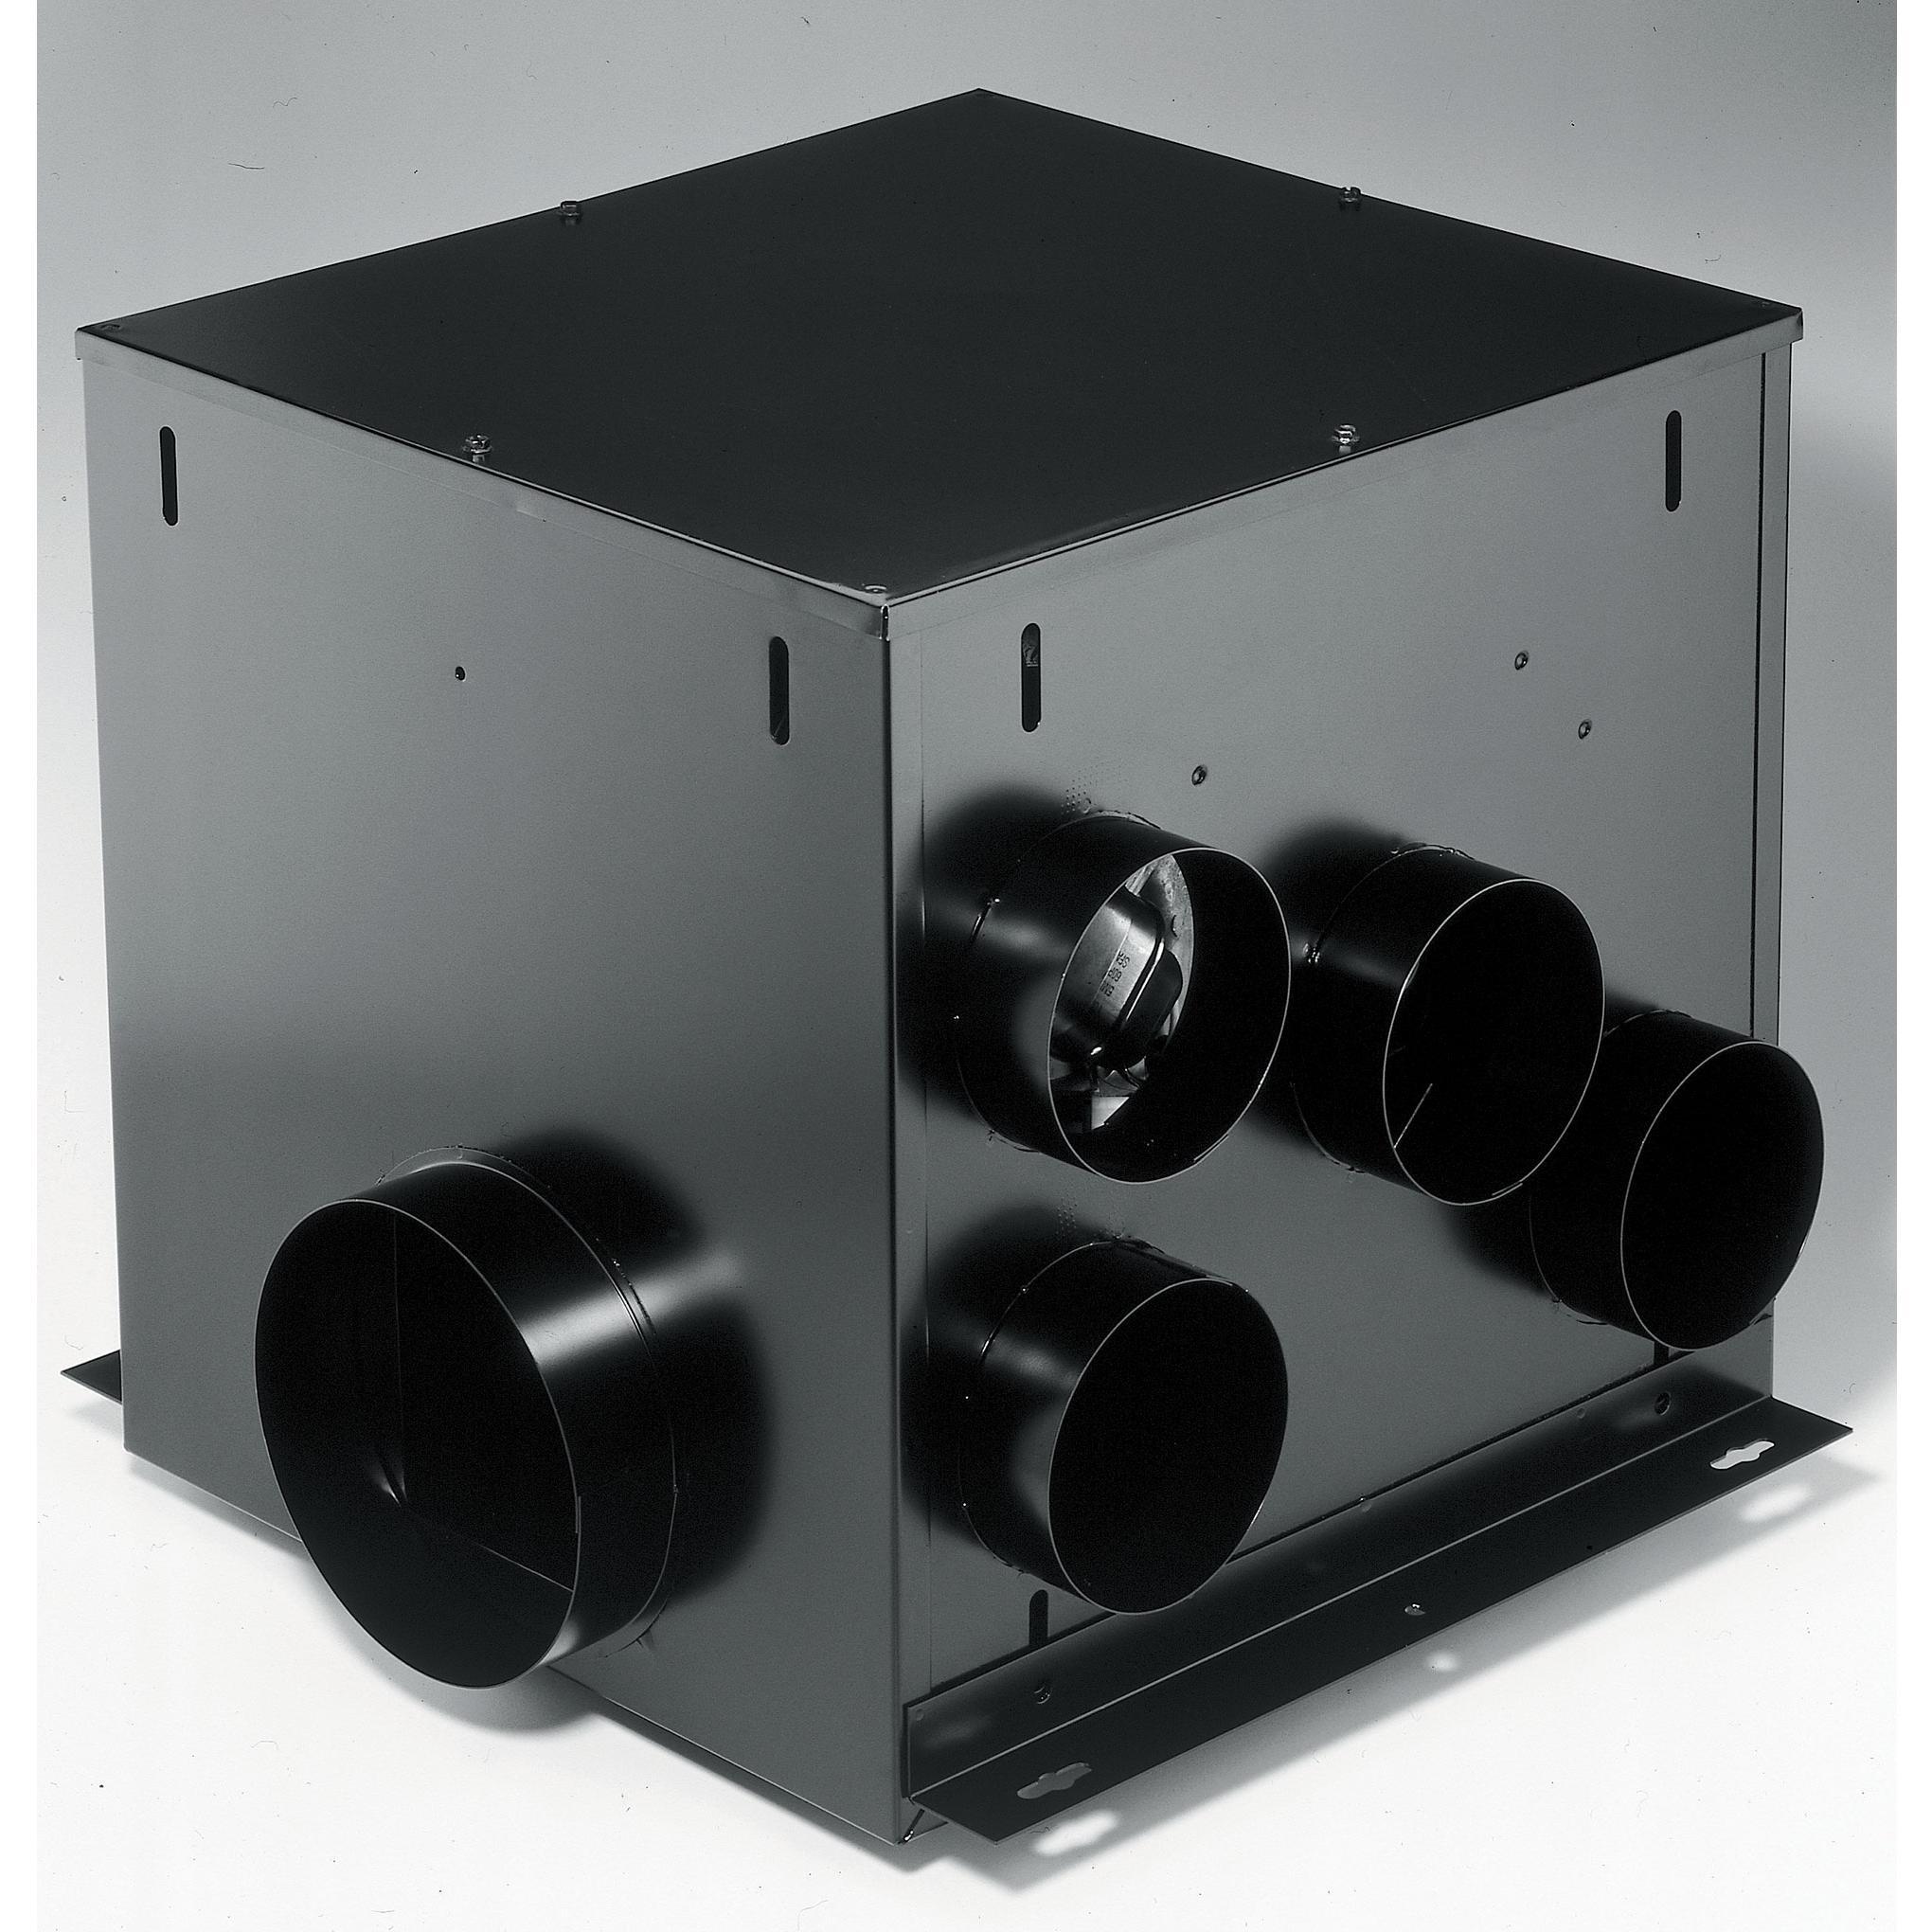 Broan MP280 Multi-Port In-Line Ventilator, 290 CFM